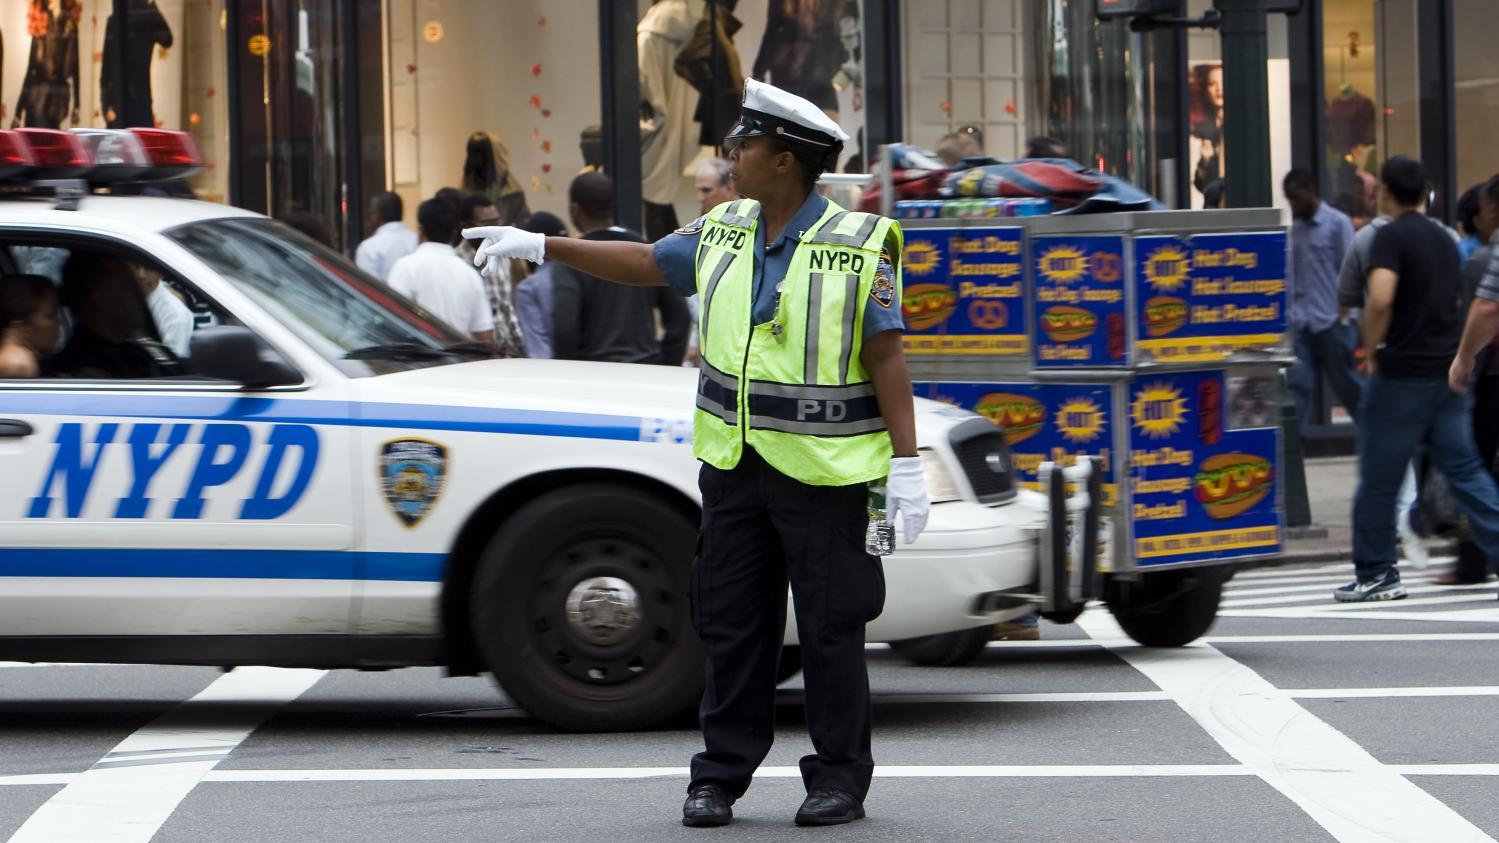 c 39 est comment ailleurs la police des polices new york. Black Bedroom Furniture Sets. Home Design Ideas